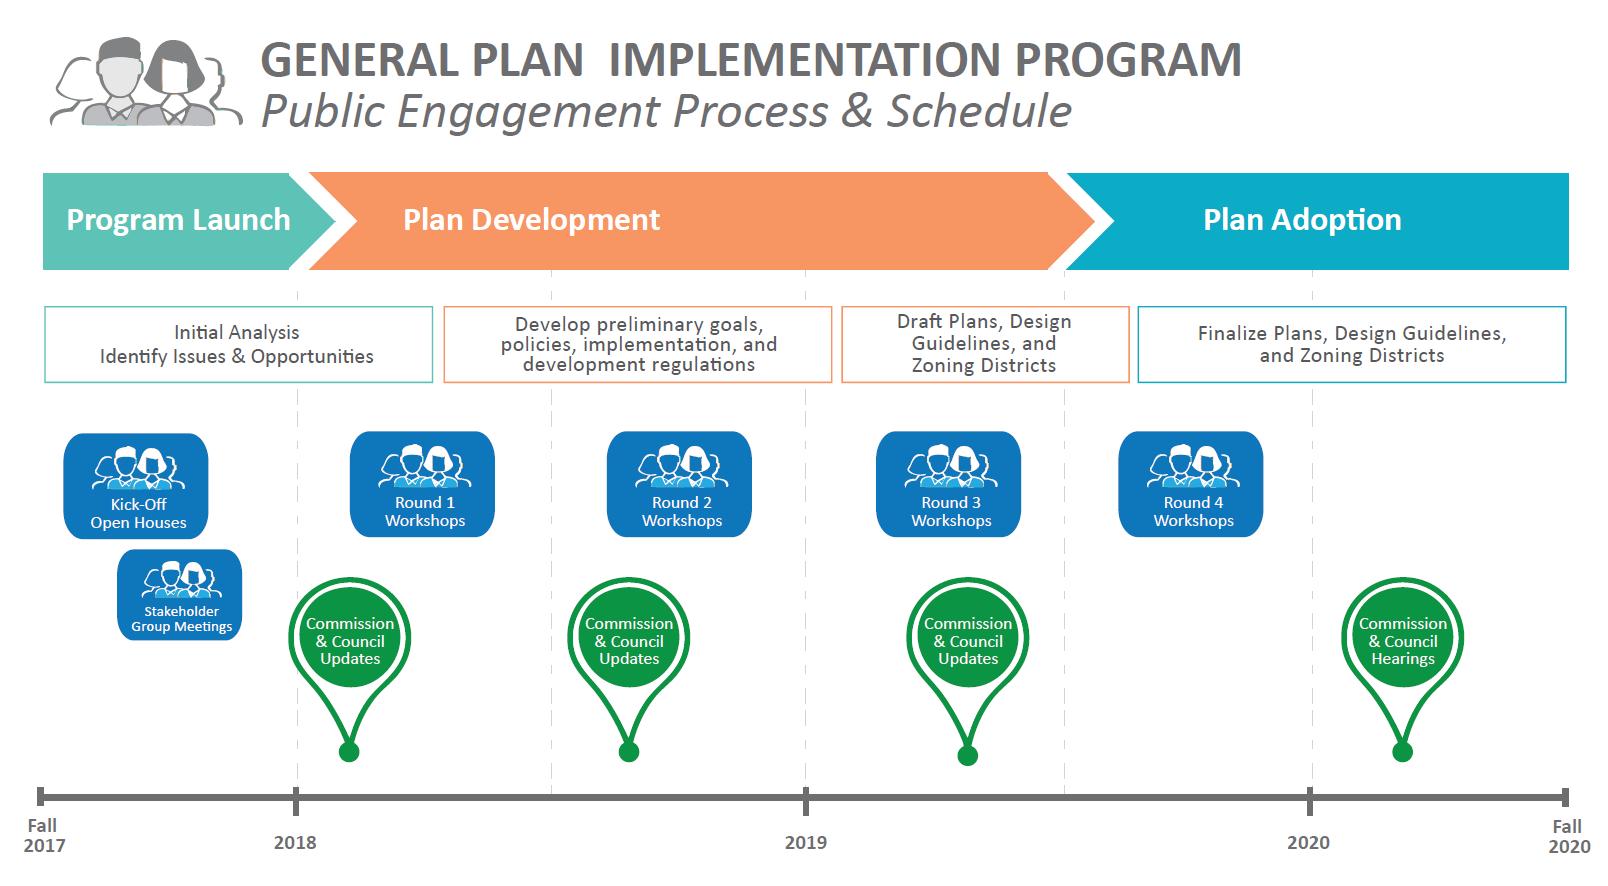 General Plan Implementation Program graphic